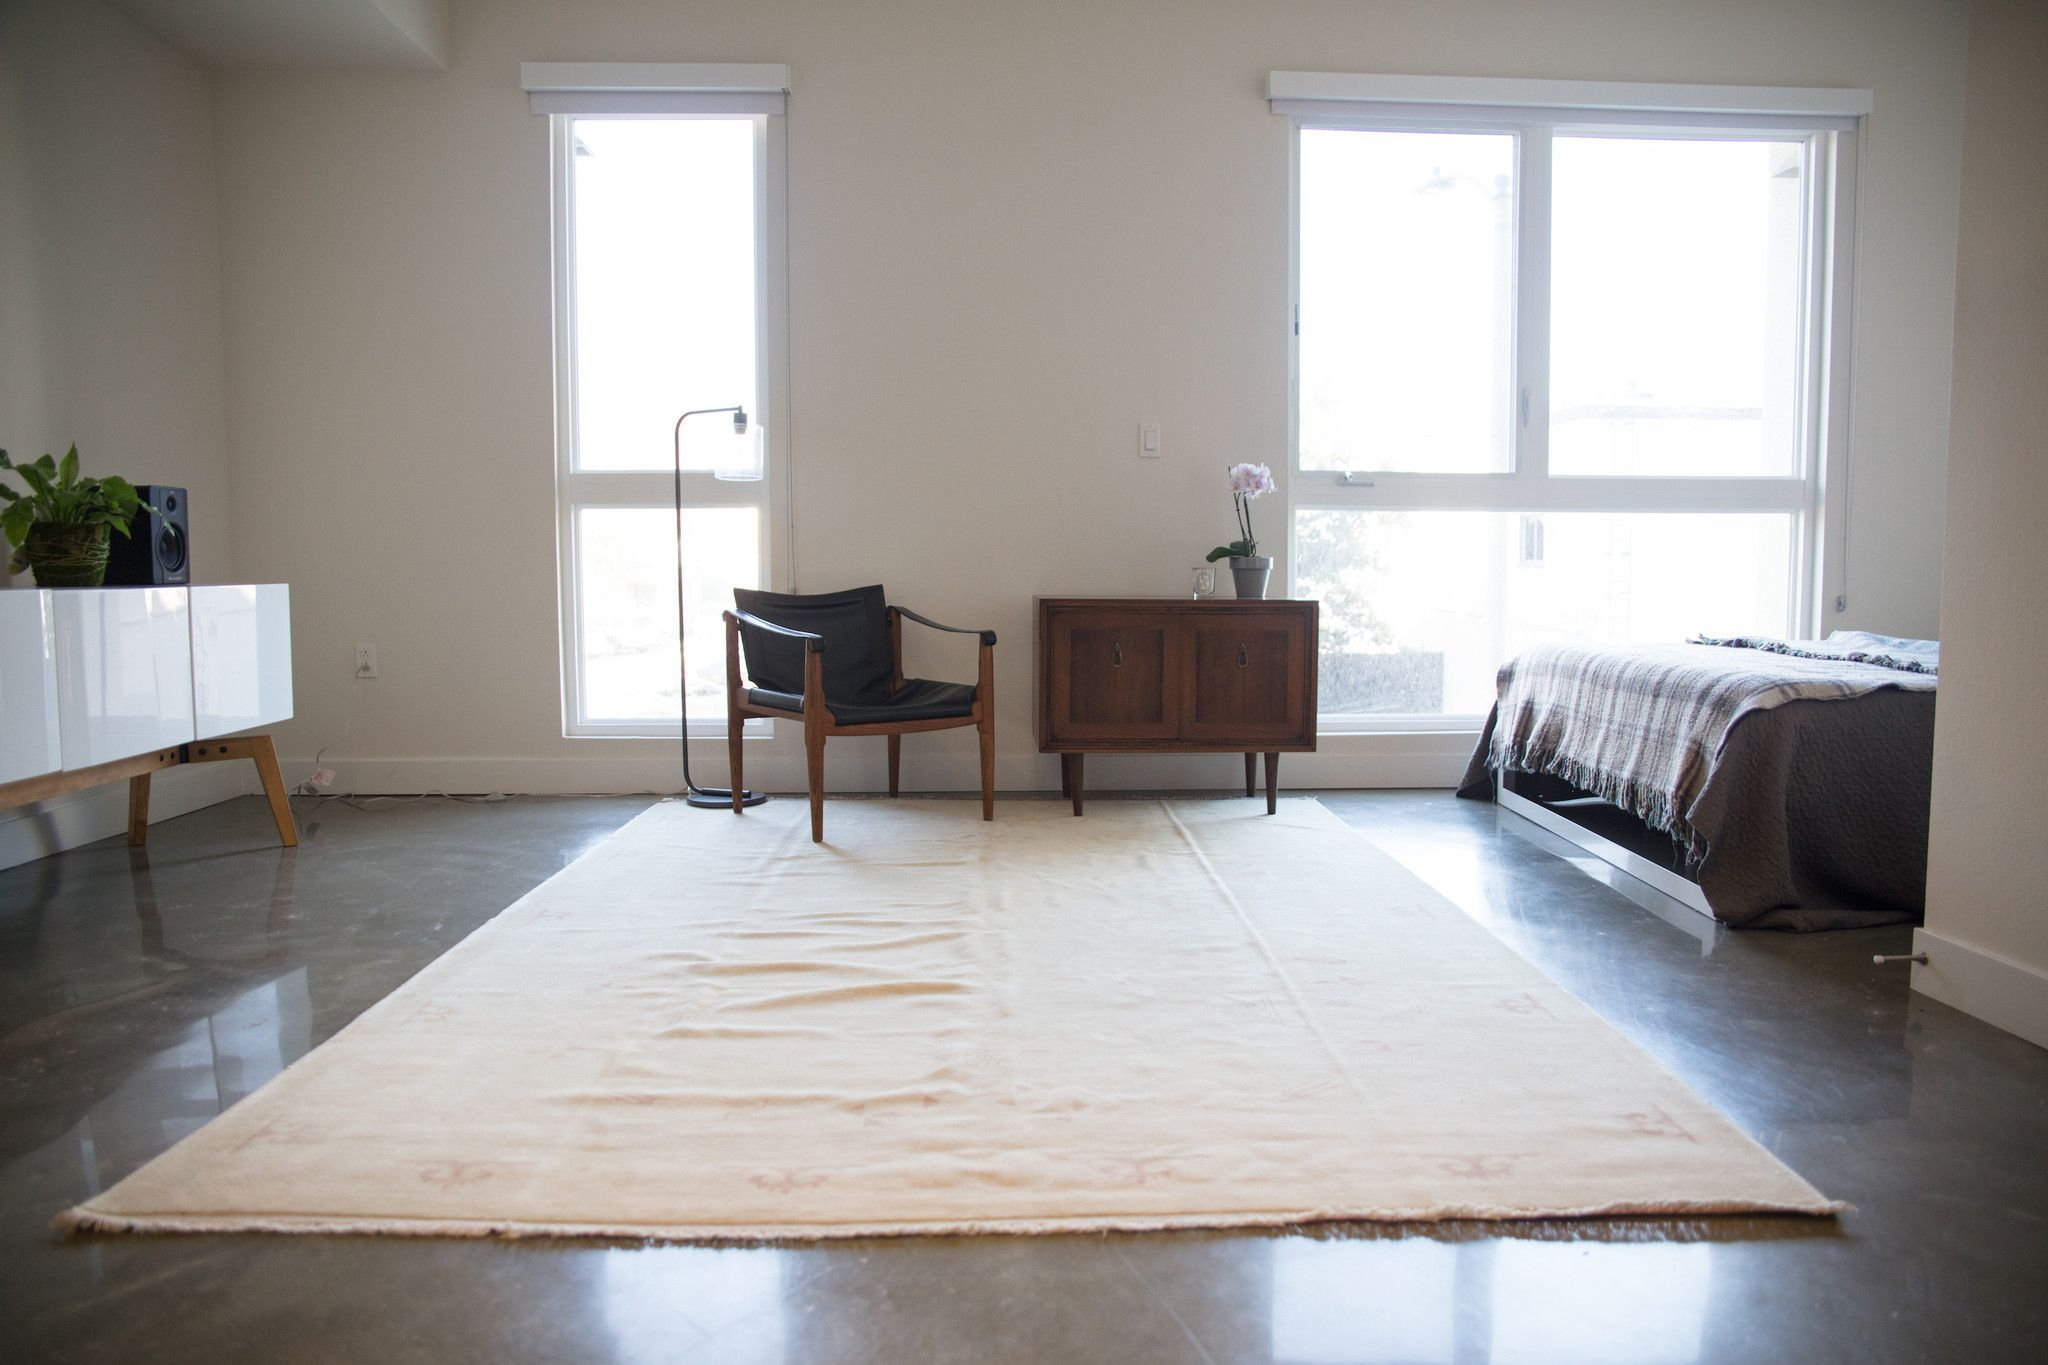 9x6' Vintage Muted Color Turkish Rug Living Room Bedroom ...